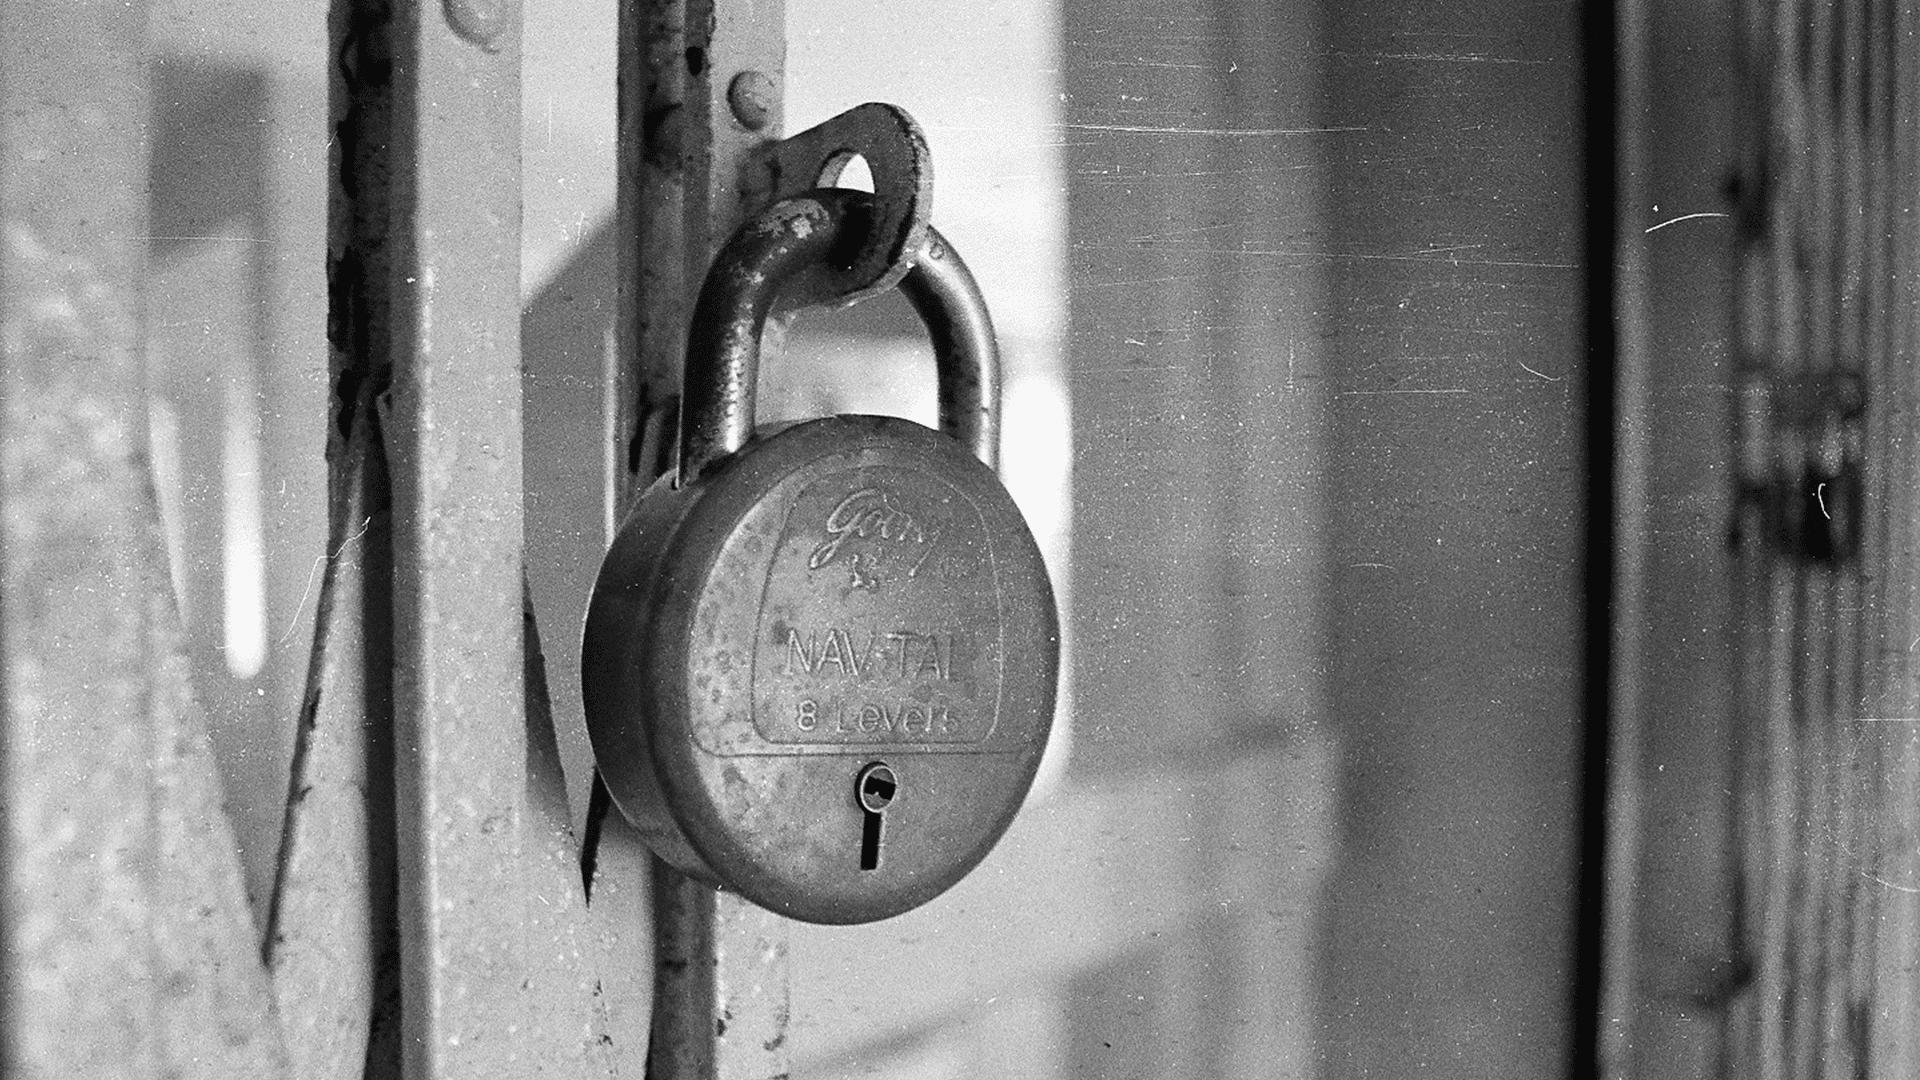 Escape Room franchising